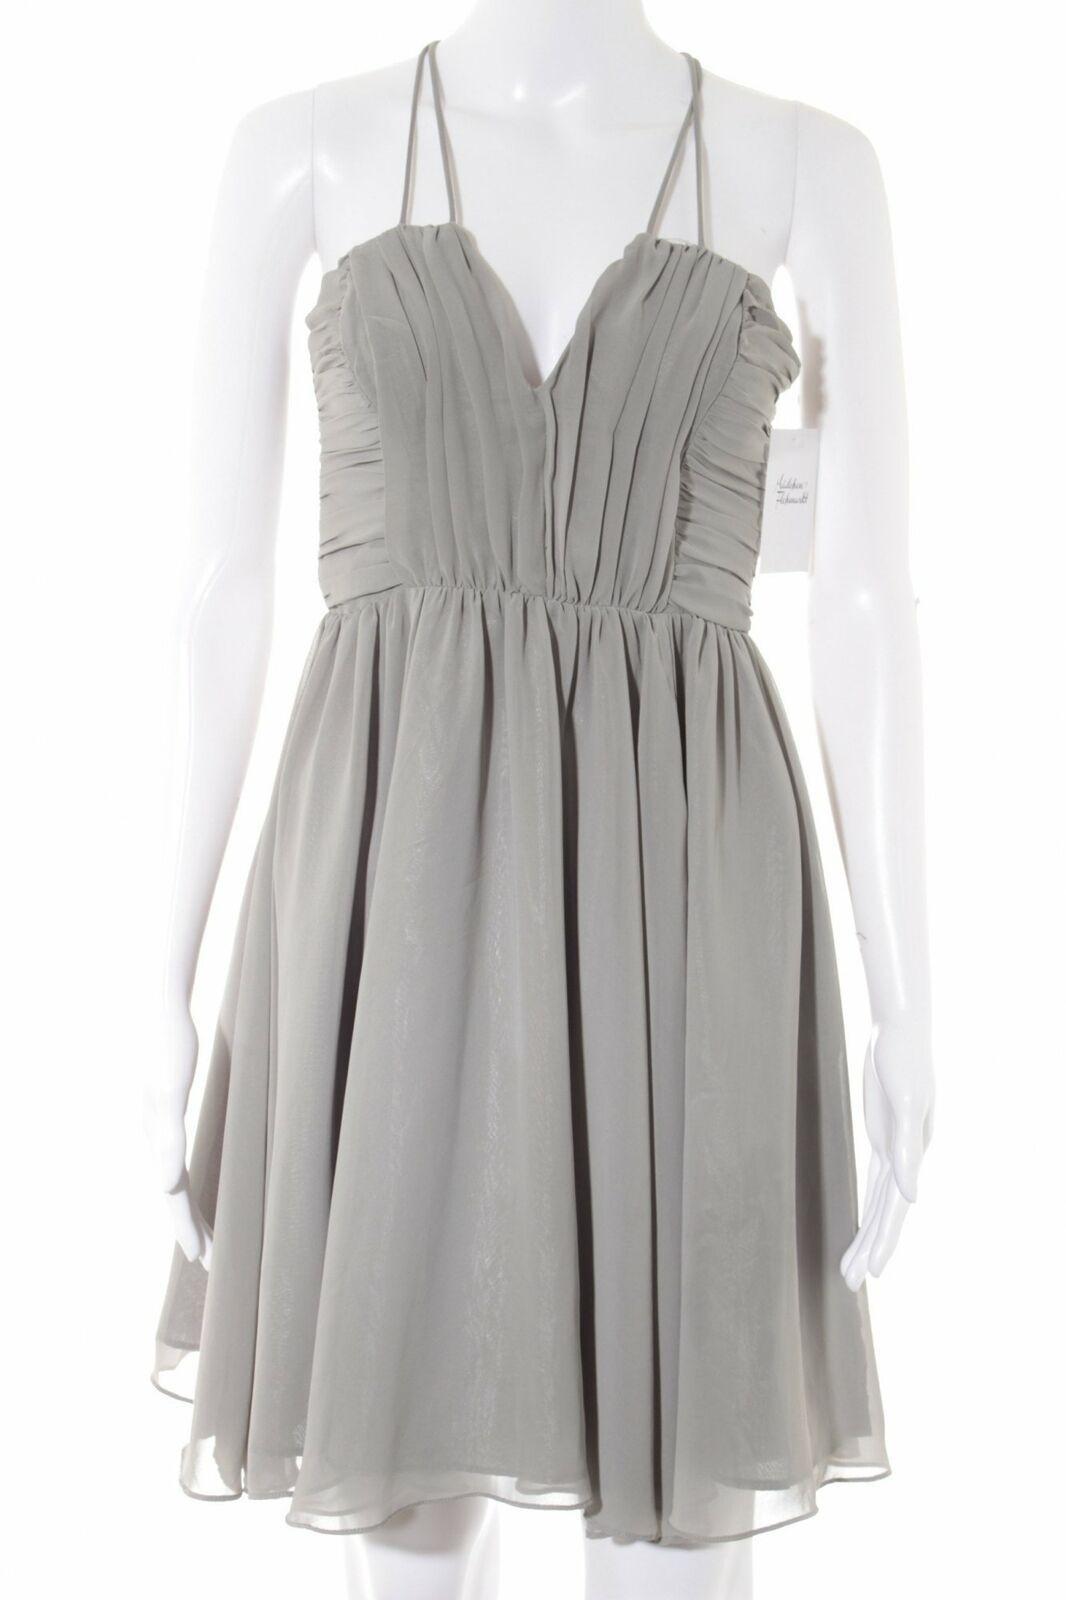 H&m Cocktailkleid Grau Elegant Damen Gr. De 34 Kleid Dress